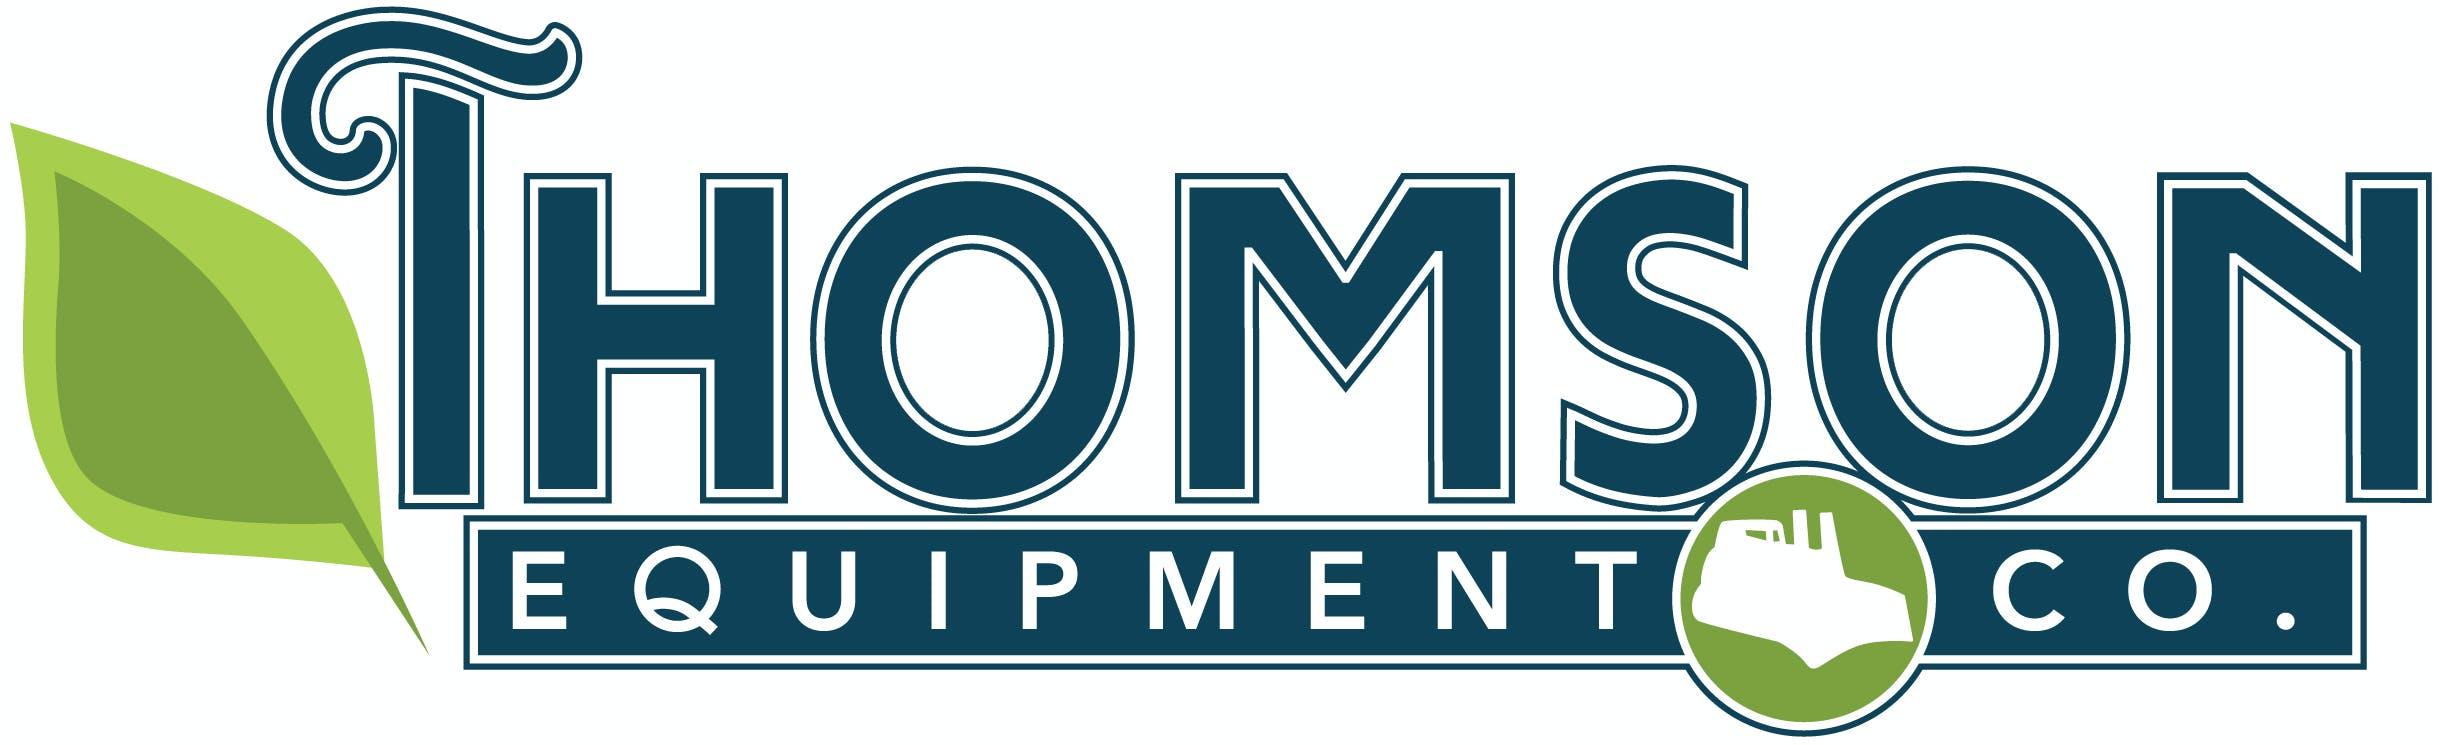 Company logo for 'Thomson Equipment'.